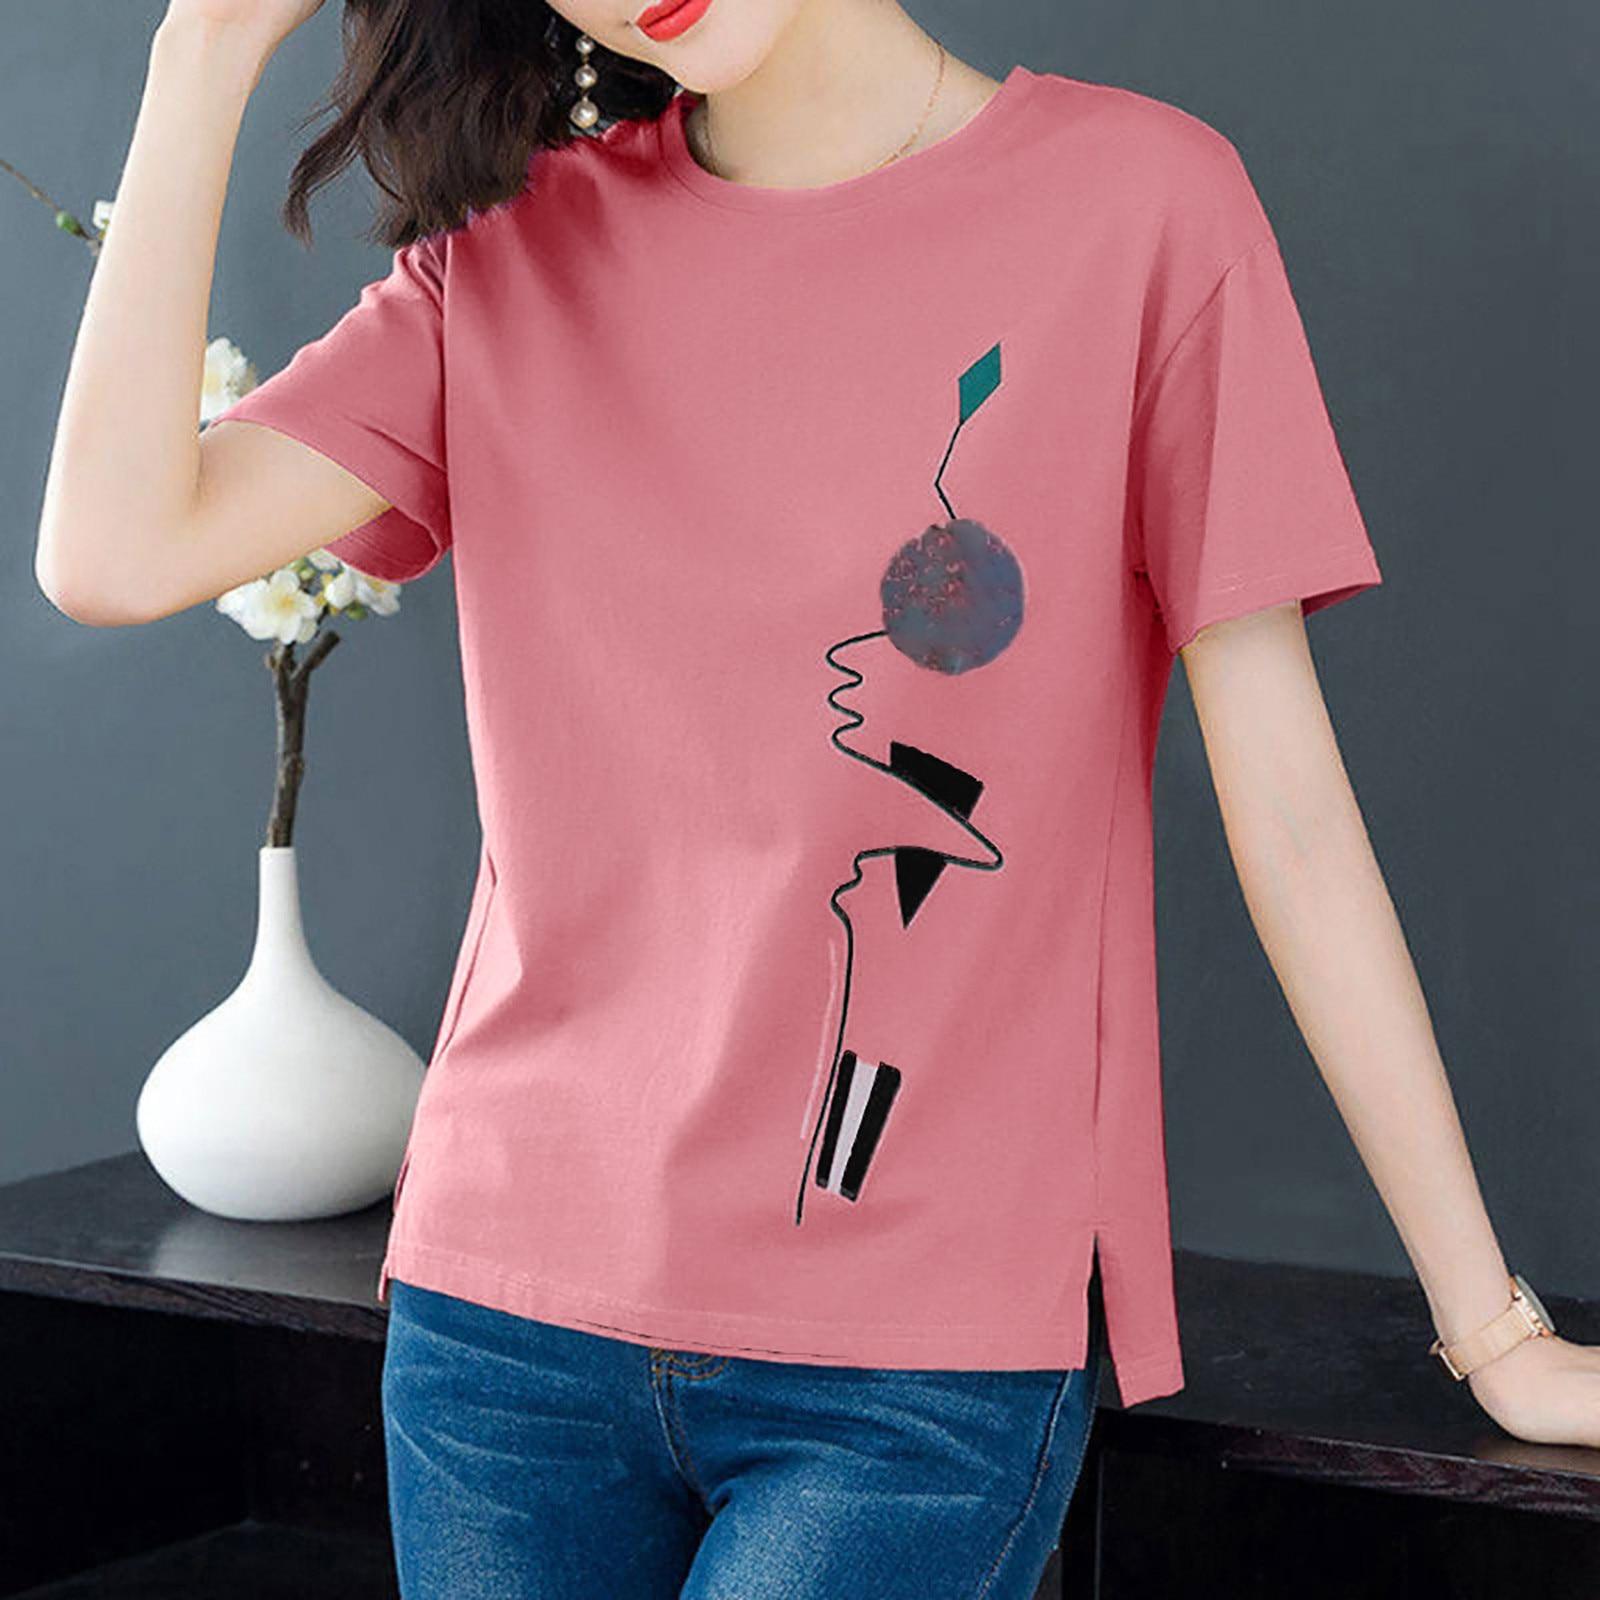 4# Short Sleeve Women's T-shirts Vintage Printed O-neck Punk Ladies T-shirt Tops T Shirt Women Women Clothing 2021 Футболка 3